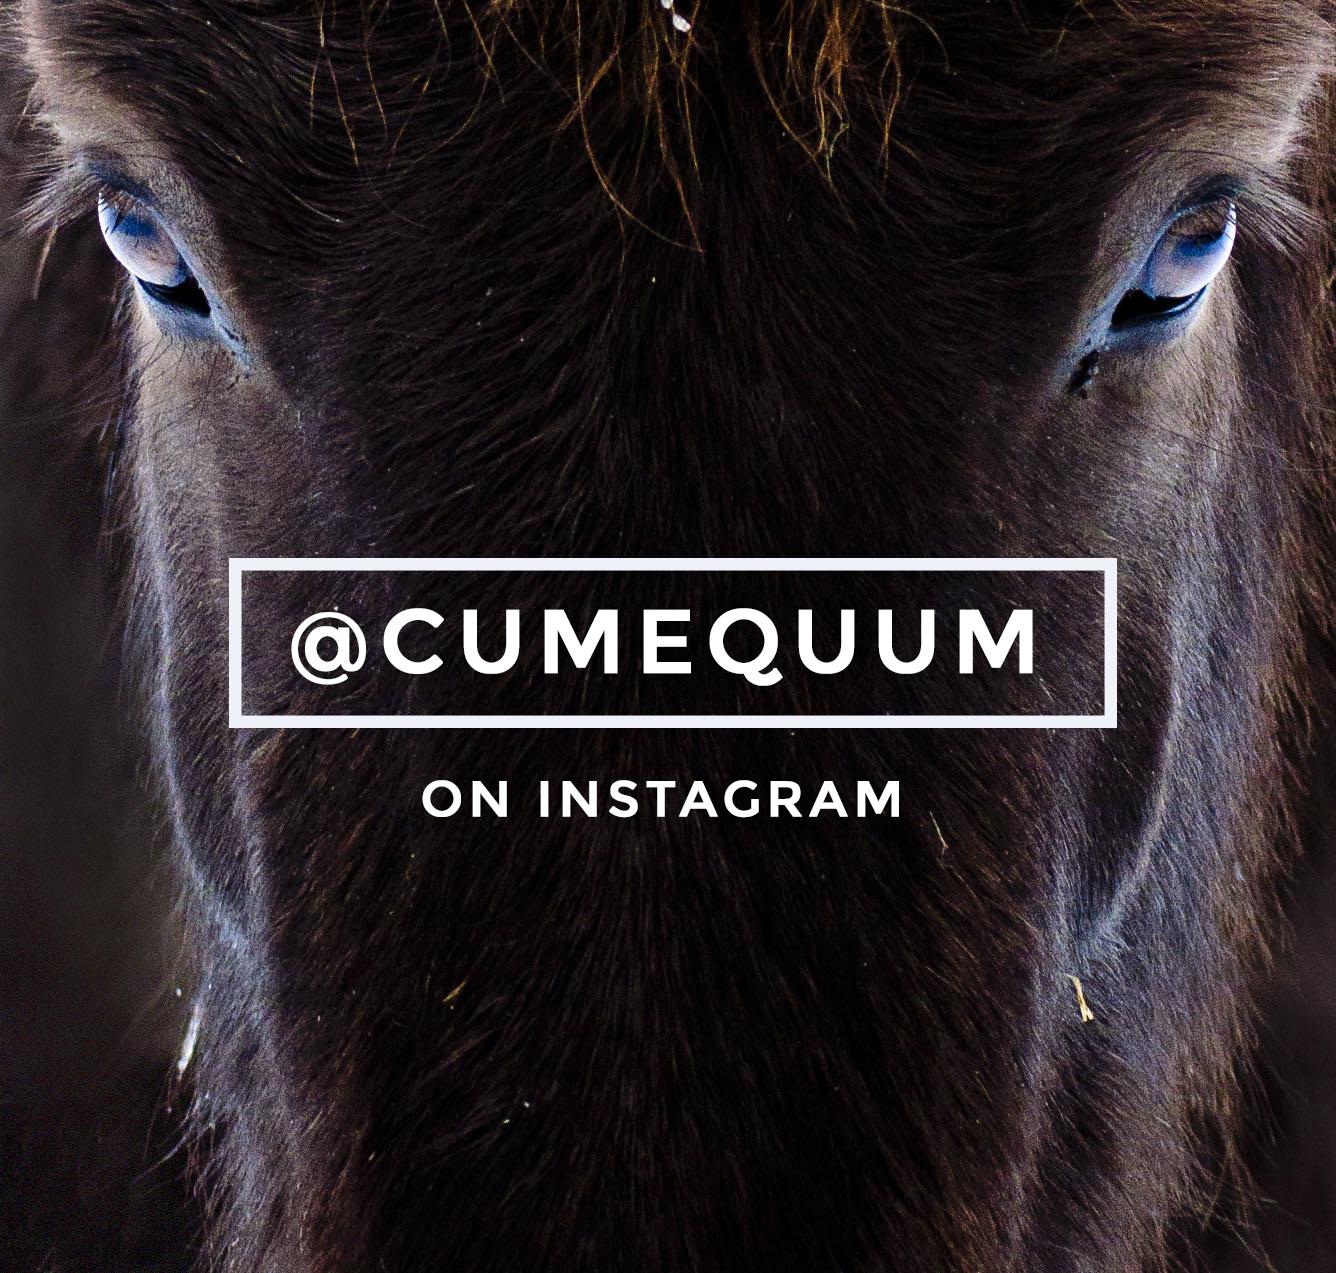 cumequum-myra-wippler-instagram.jpg